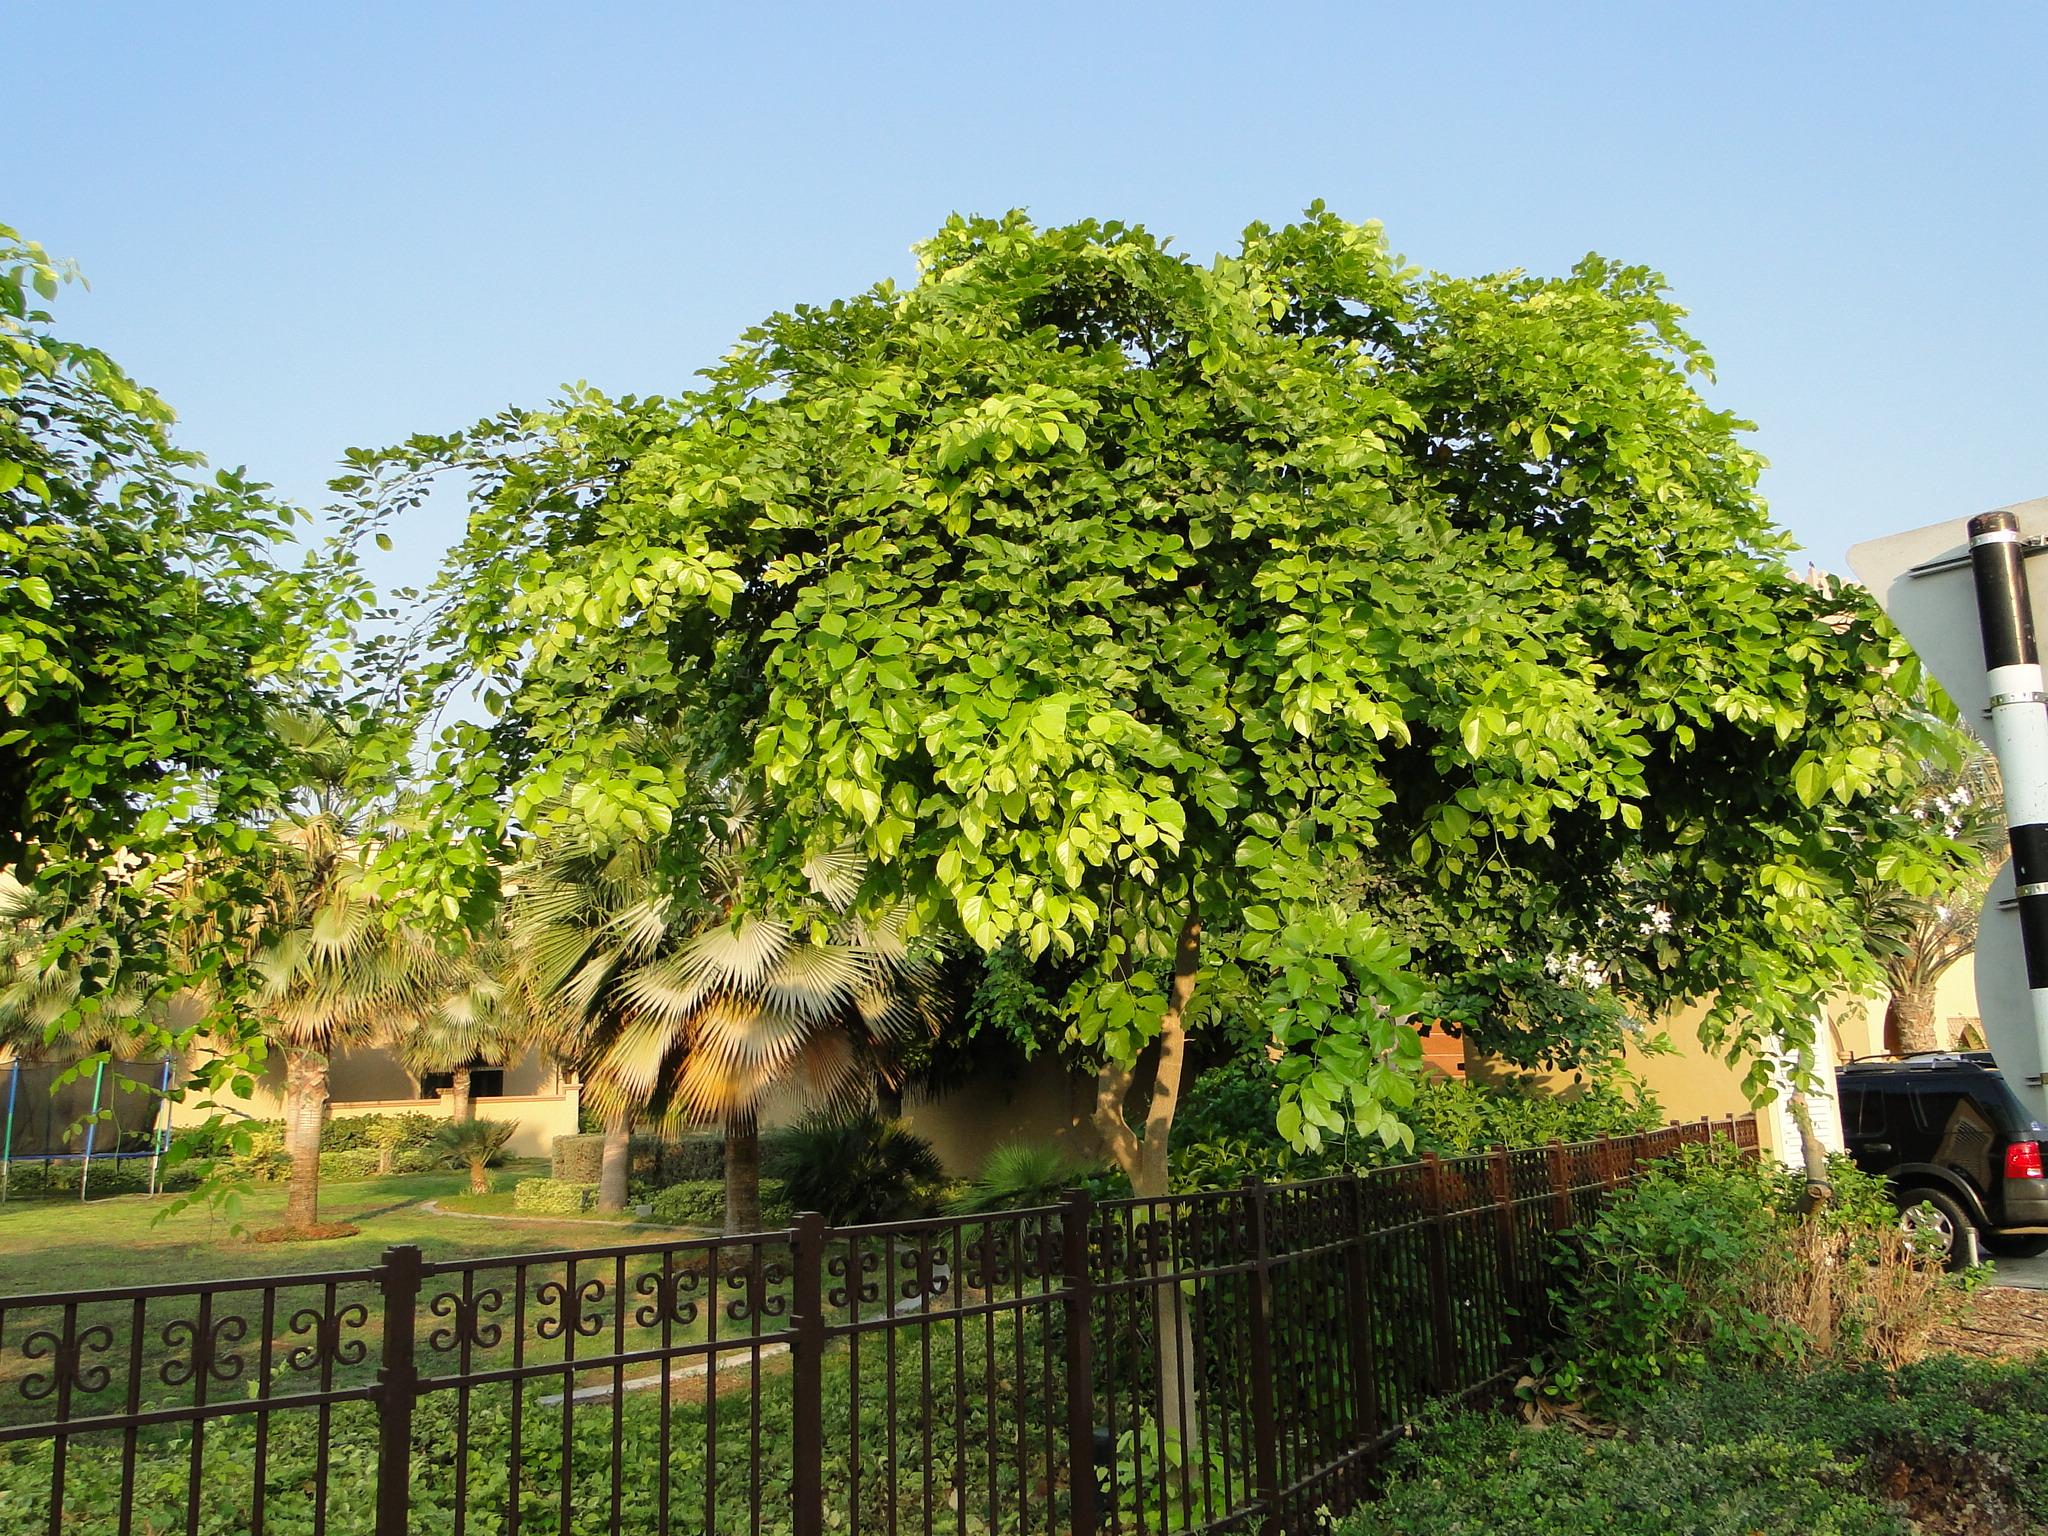 Pongamia glabra or Pongame oil tree